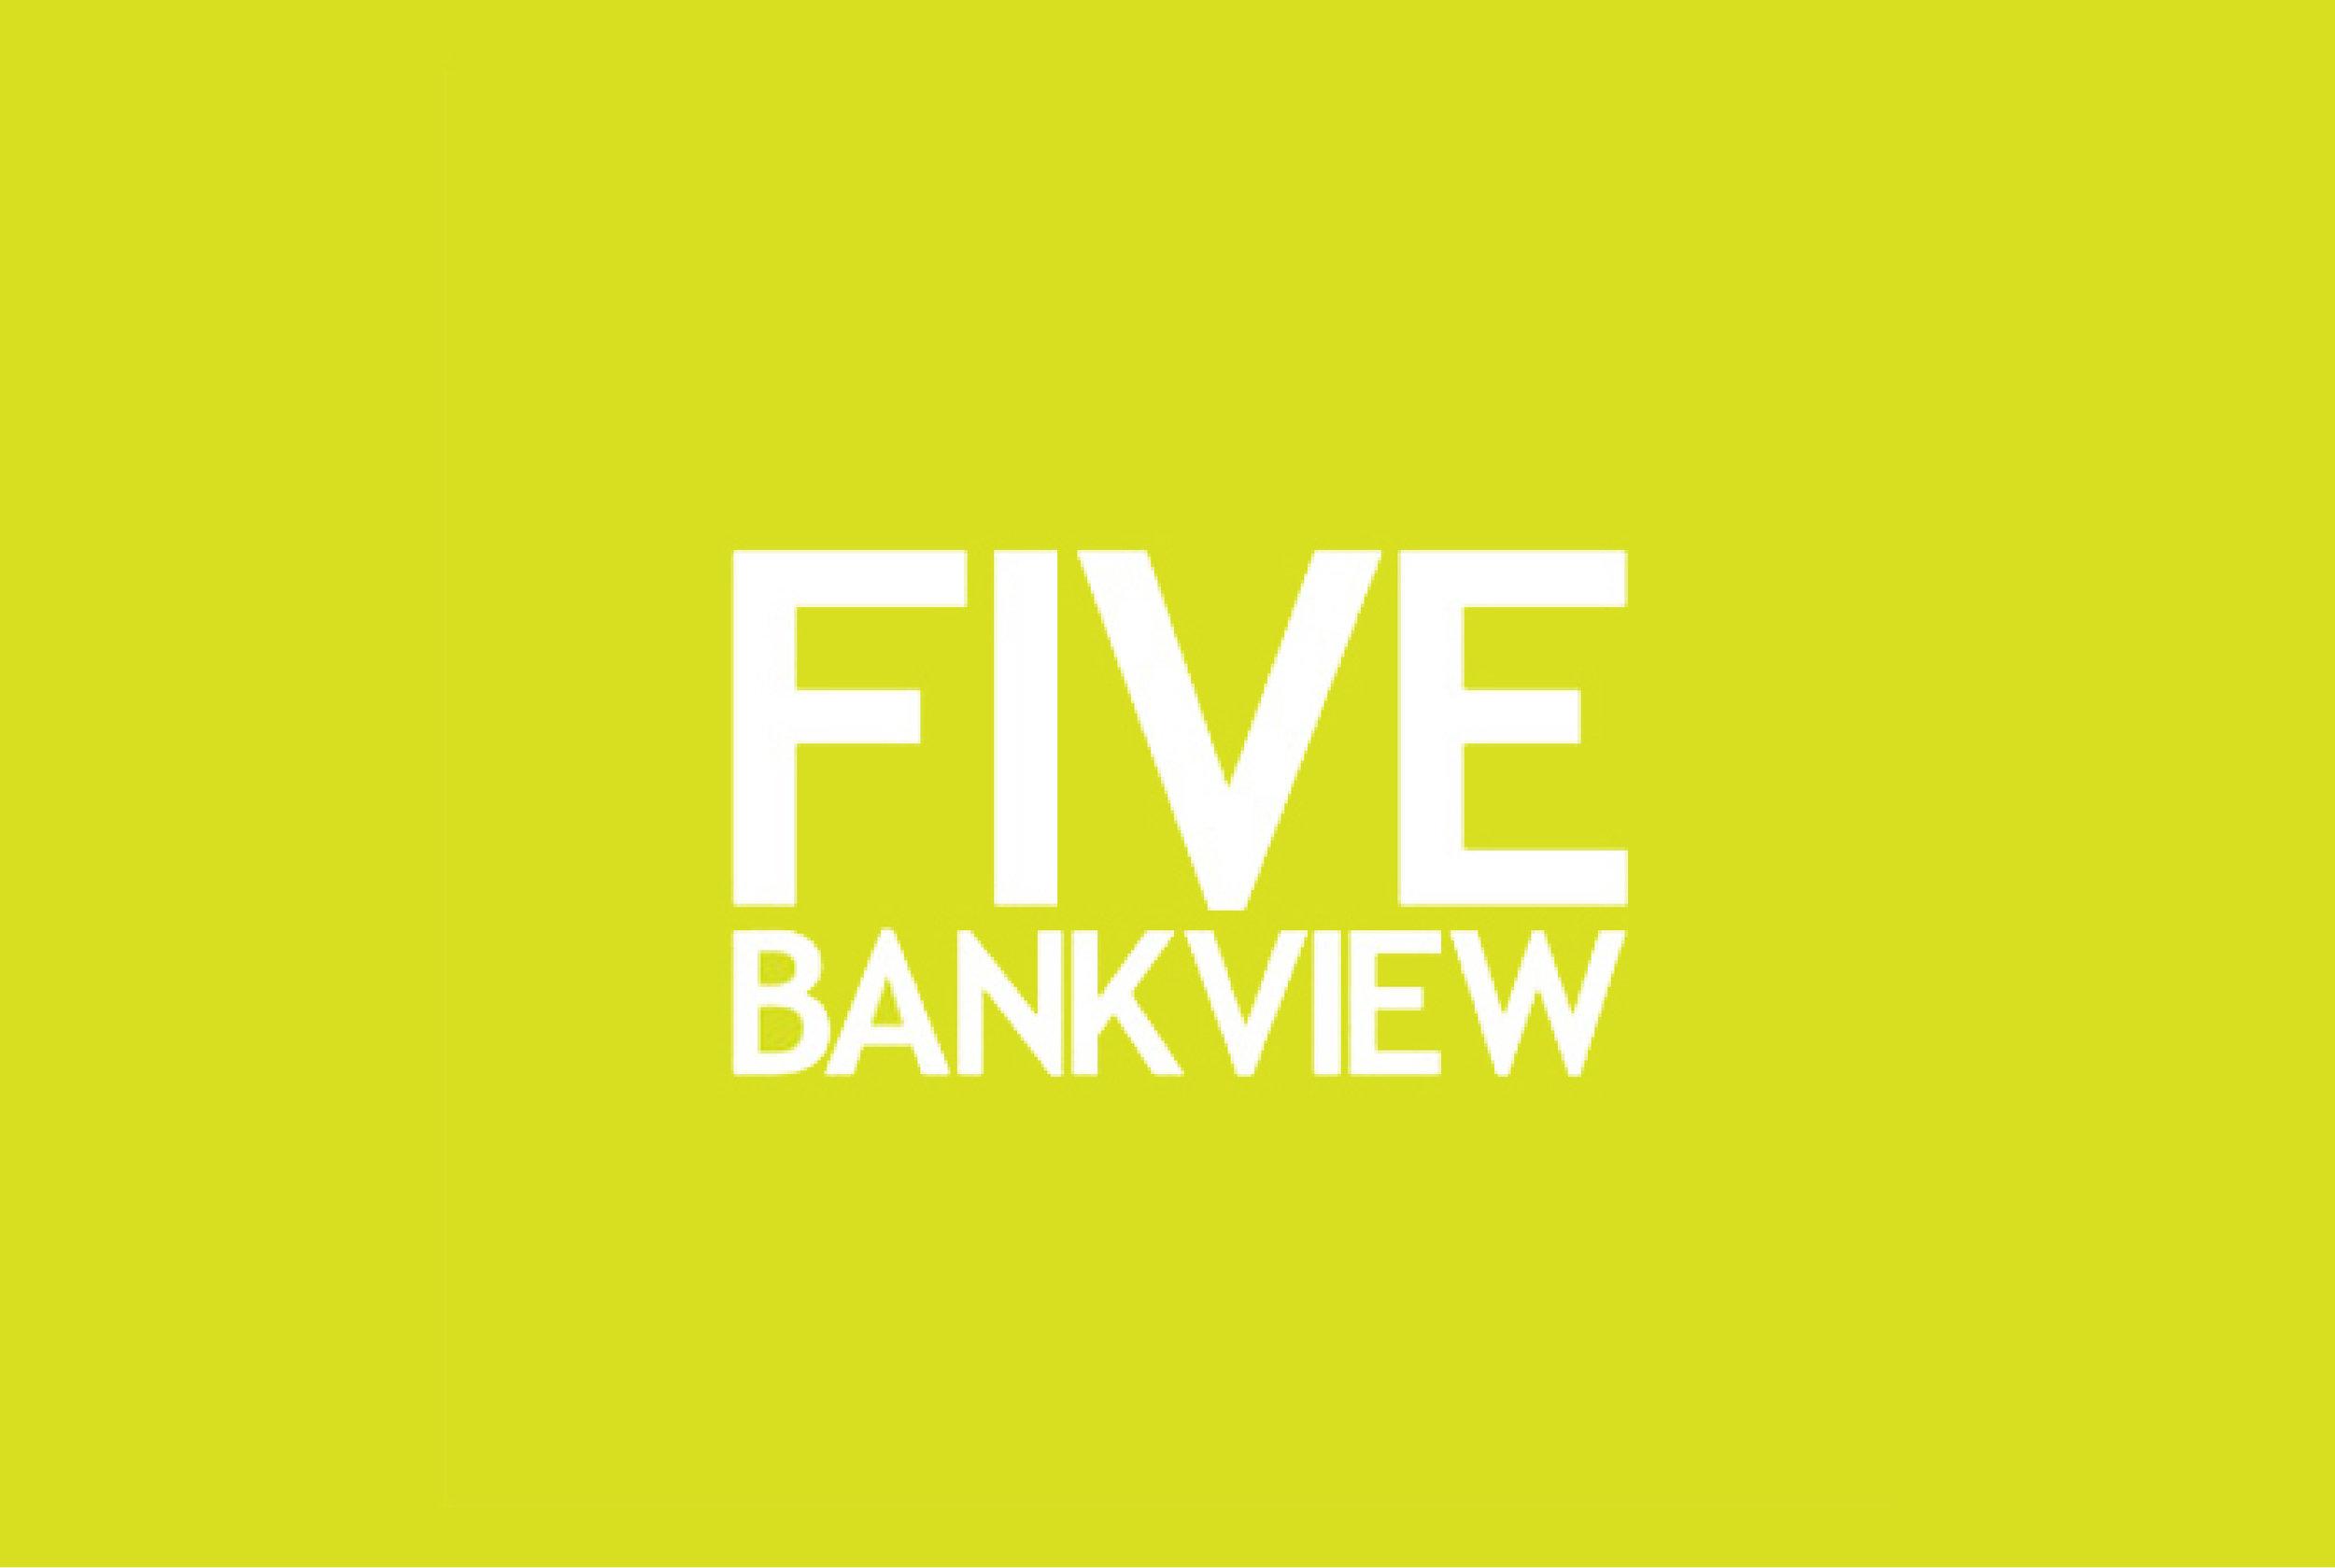 swell-yyc-portfolio-five-bankview-02